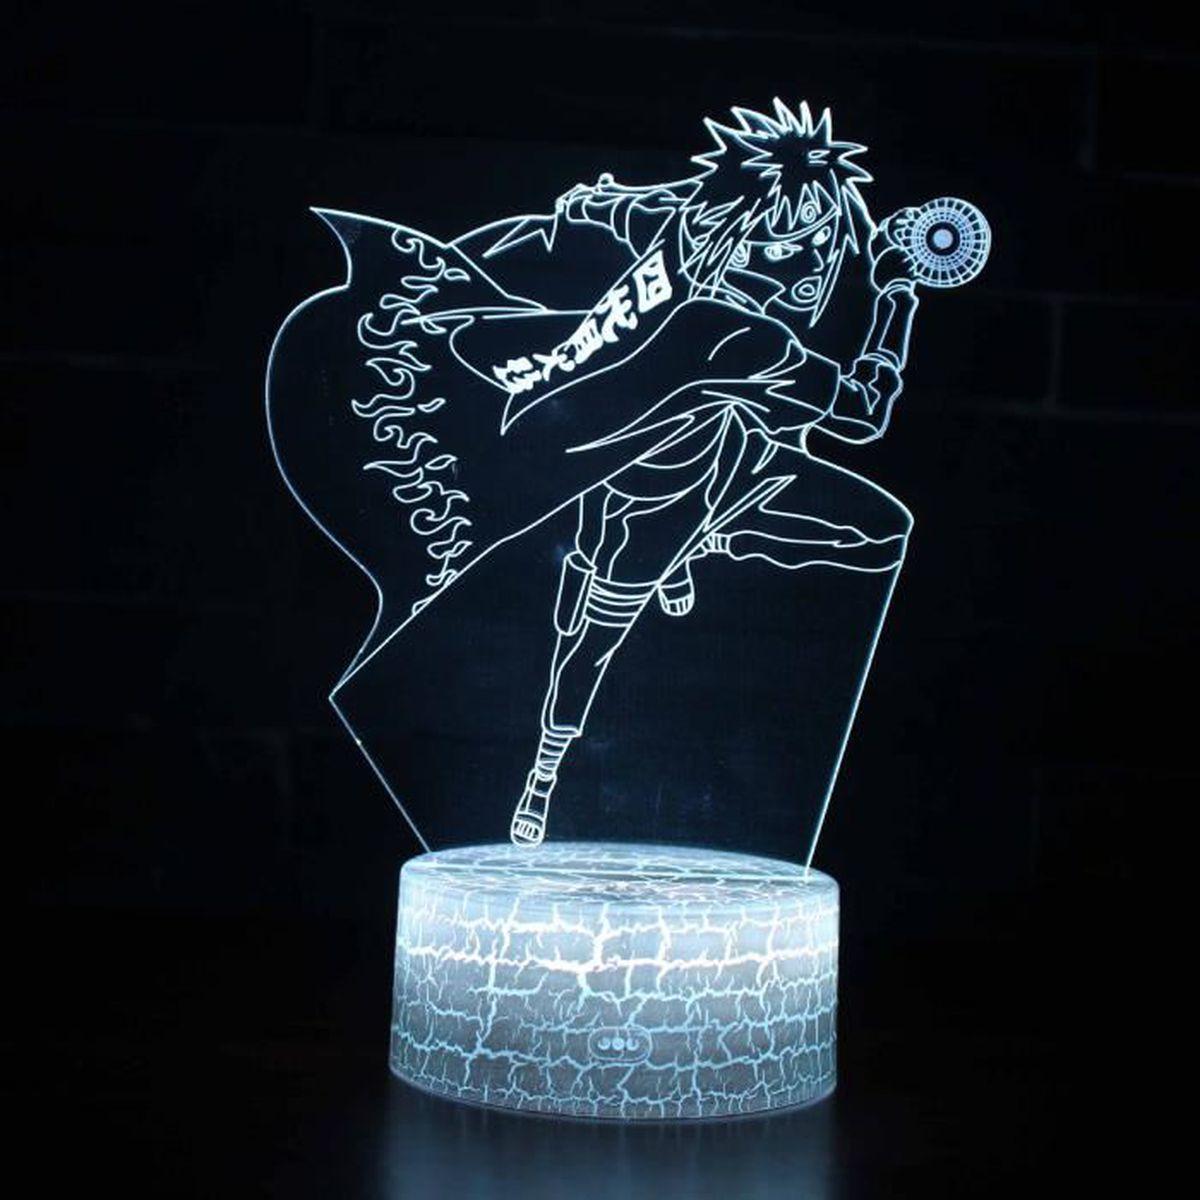 Naruto Kakashi Sasuke Lampe Lumiere De Cadeau 3d Creative Couleur